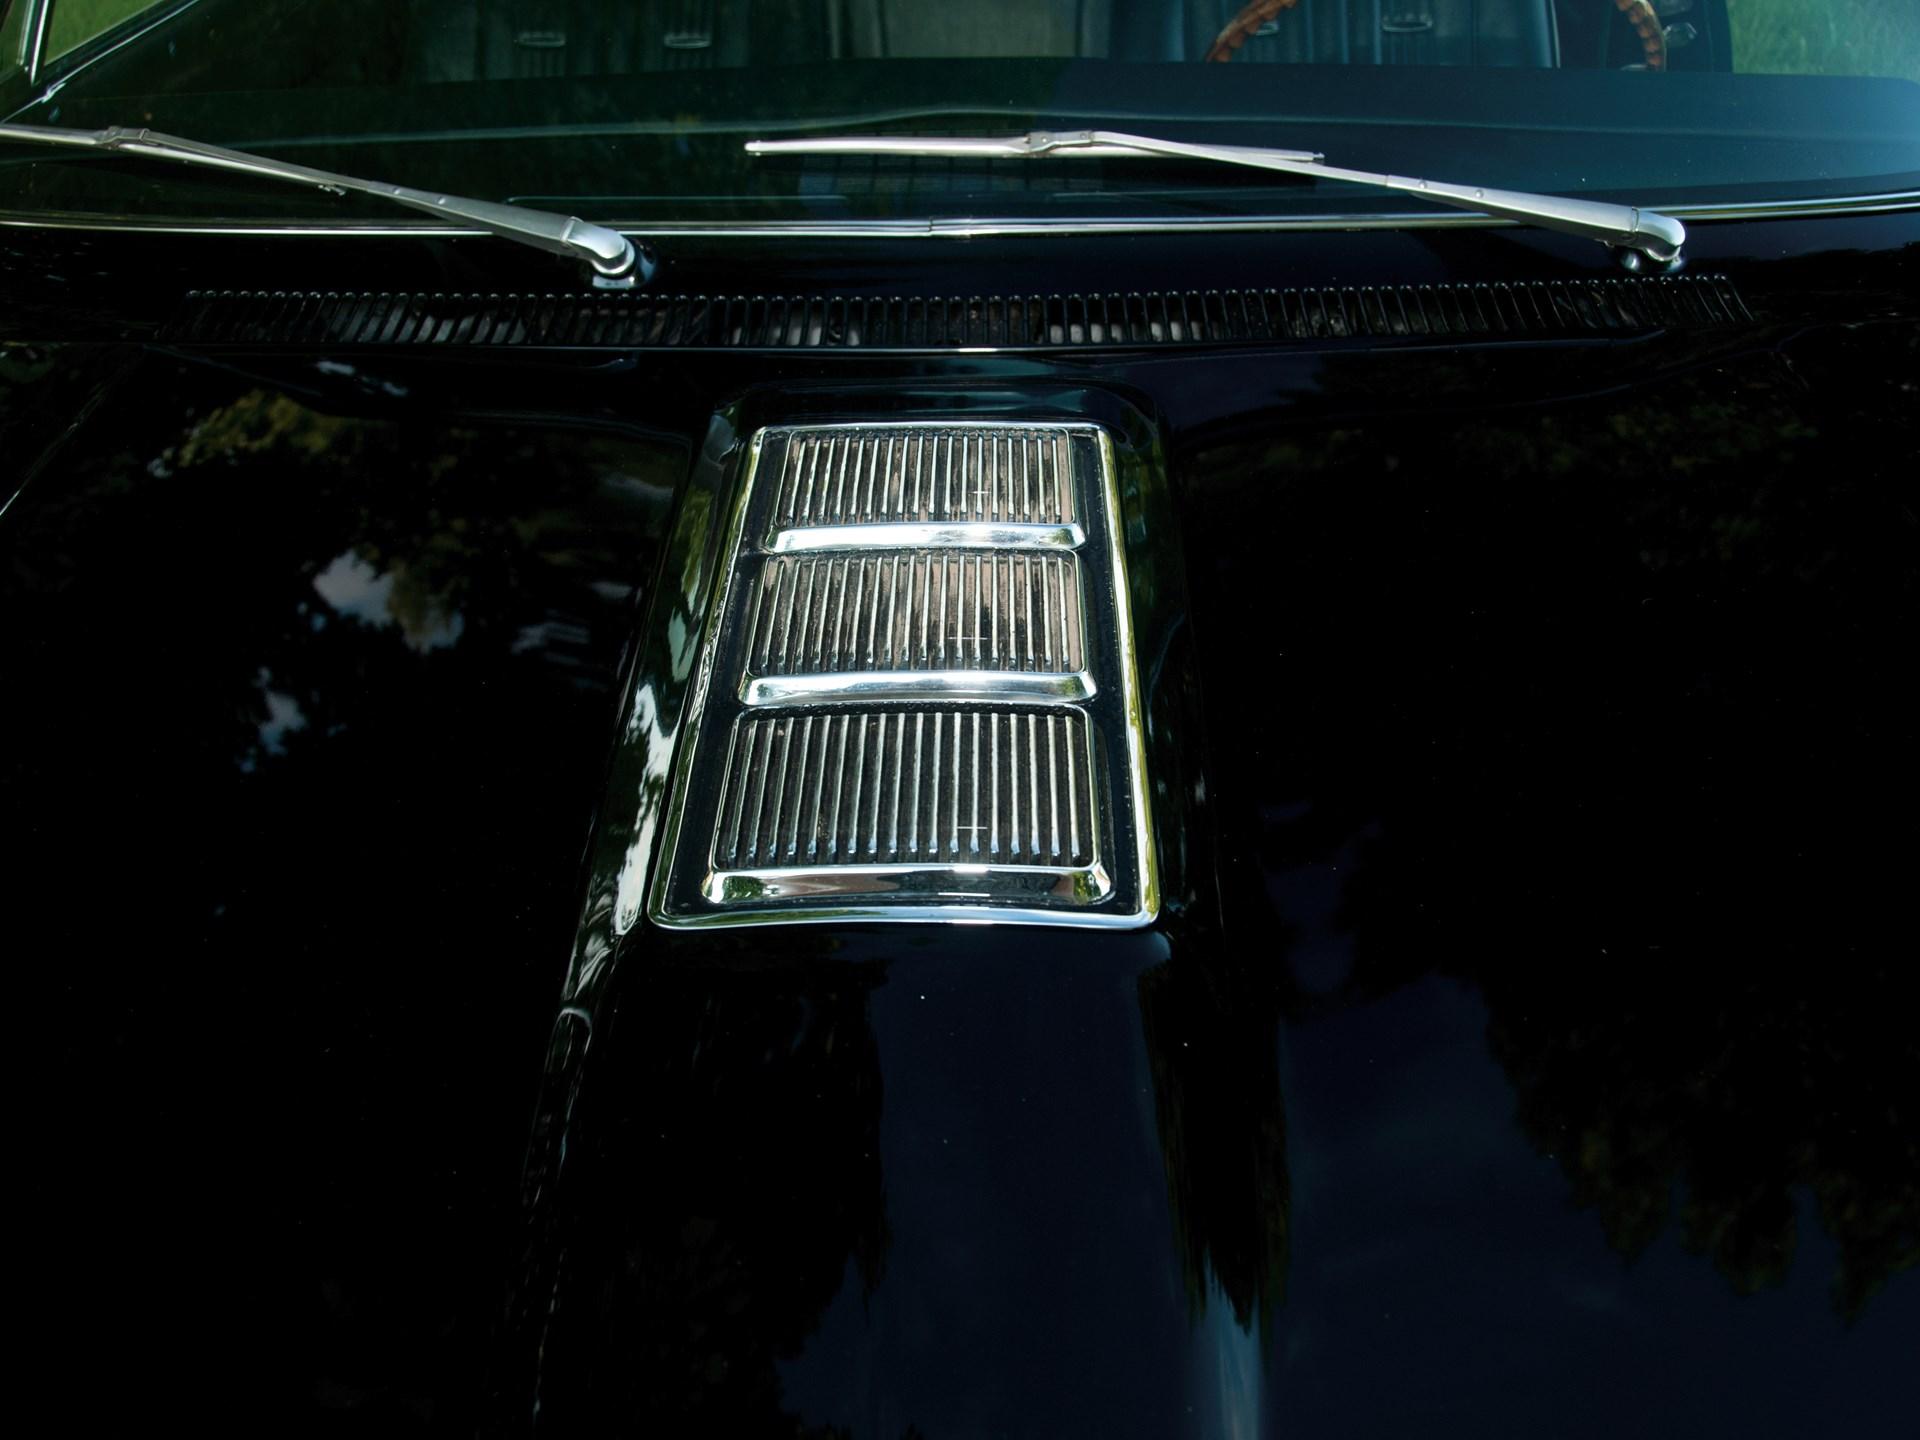 RM Sotheby s 1967 Chevrolet Impala SS 427 Convertible